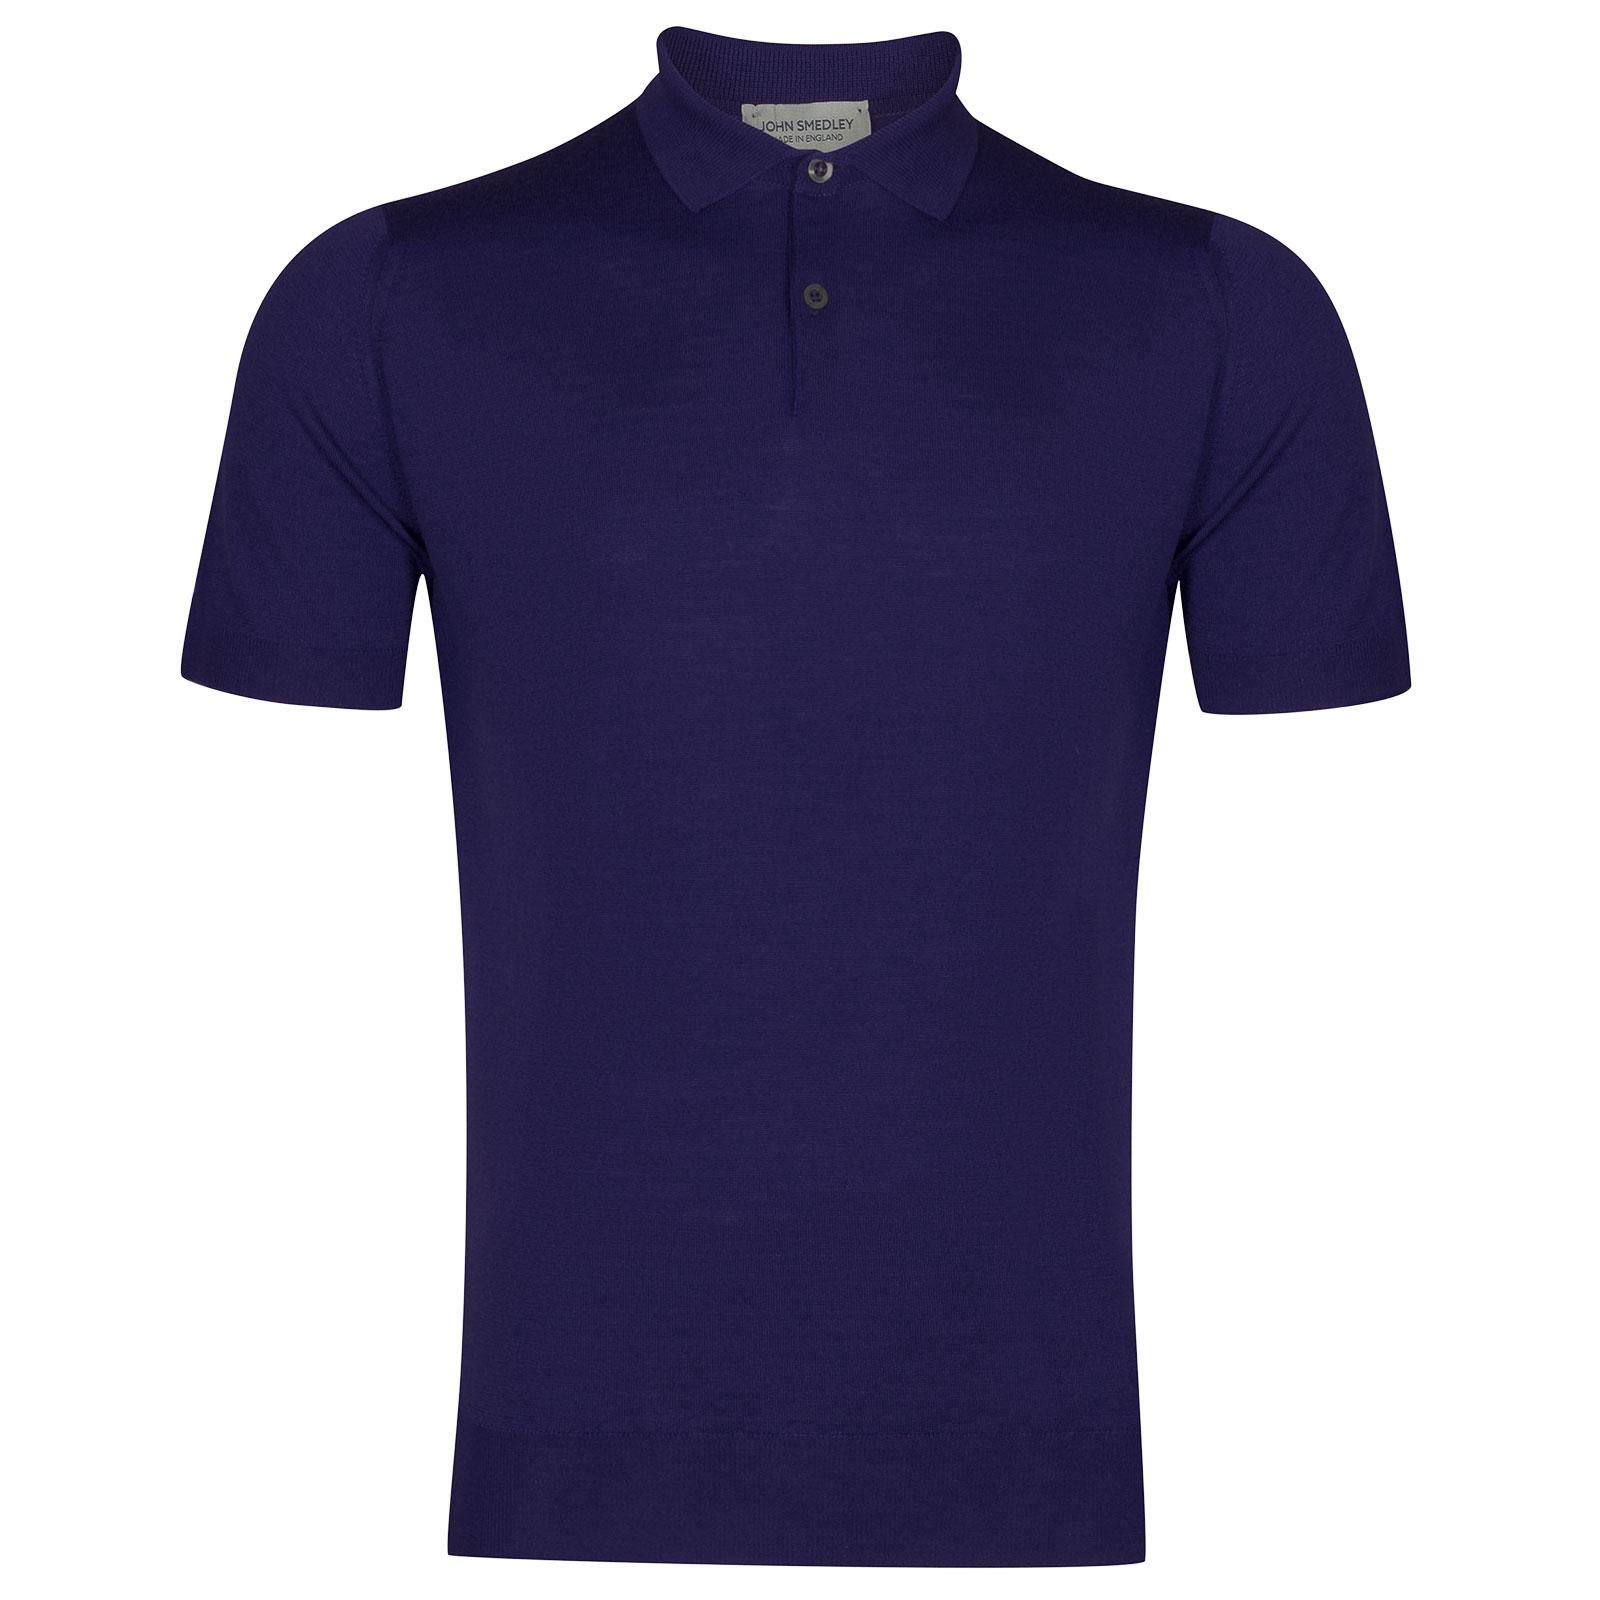 John Smedley Payton Merino Wool Shirt in Serge Blue-XXL